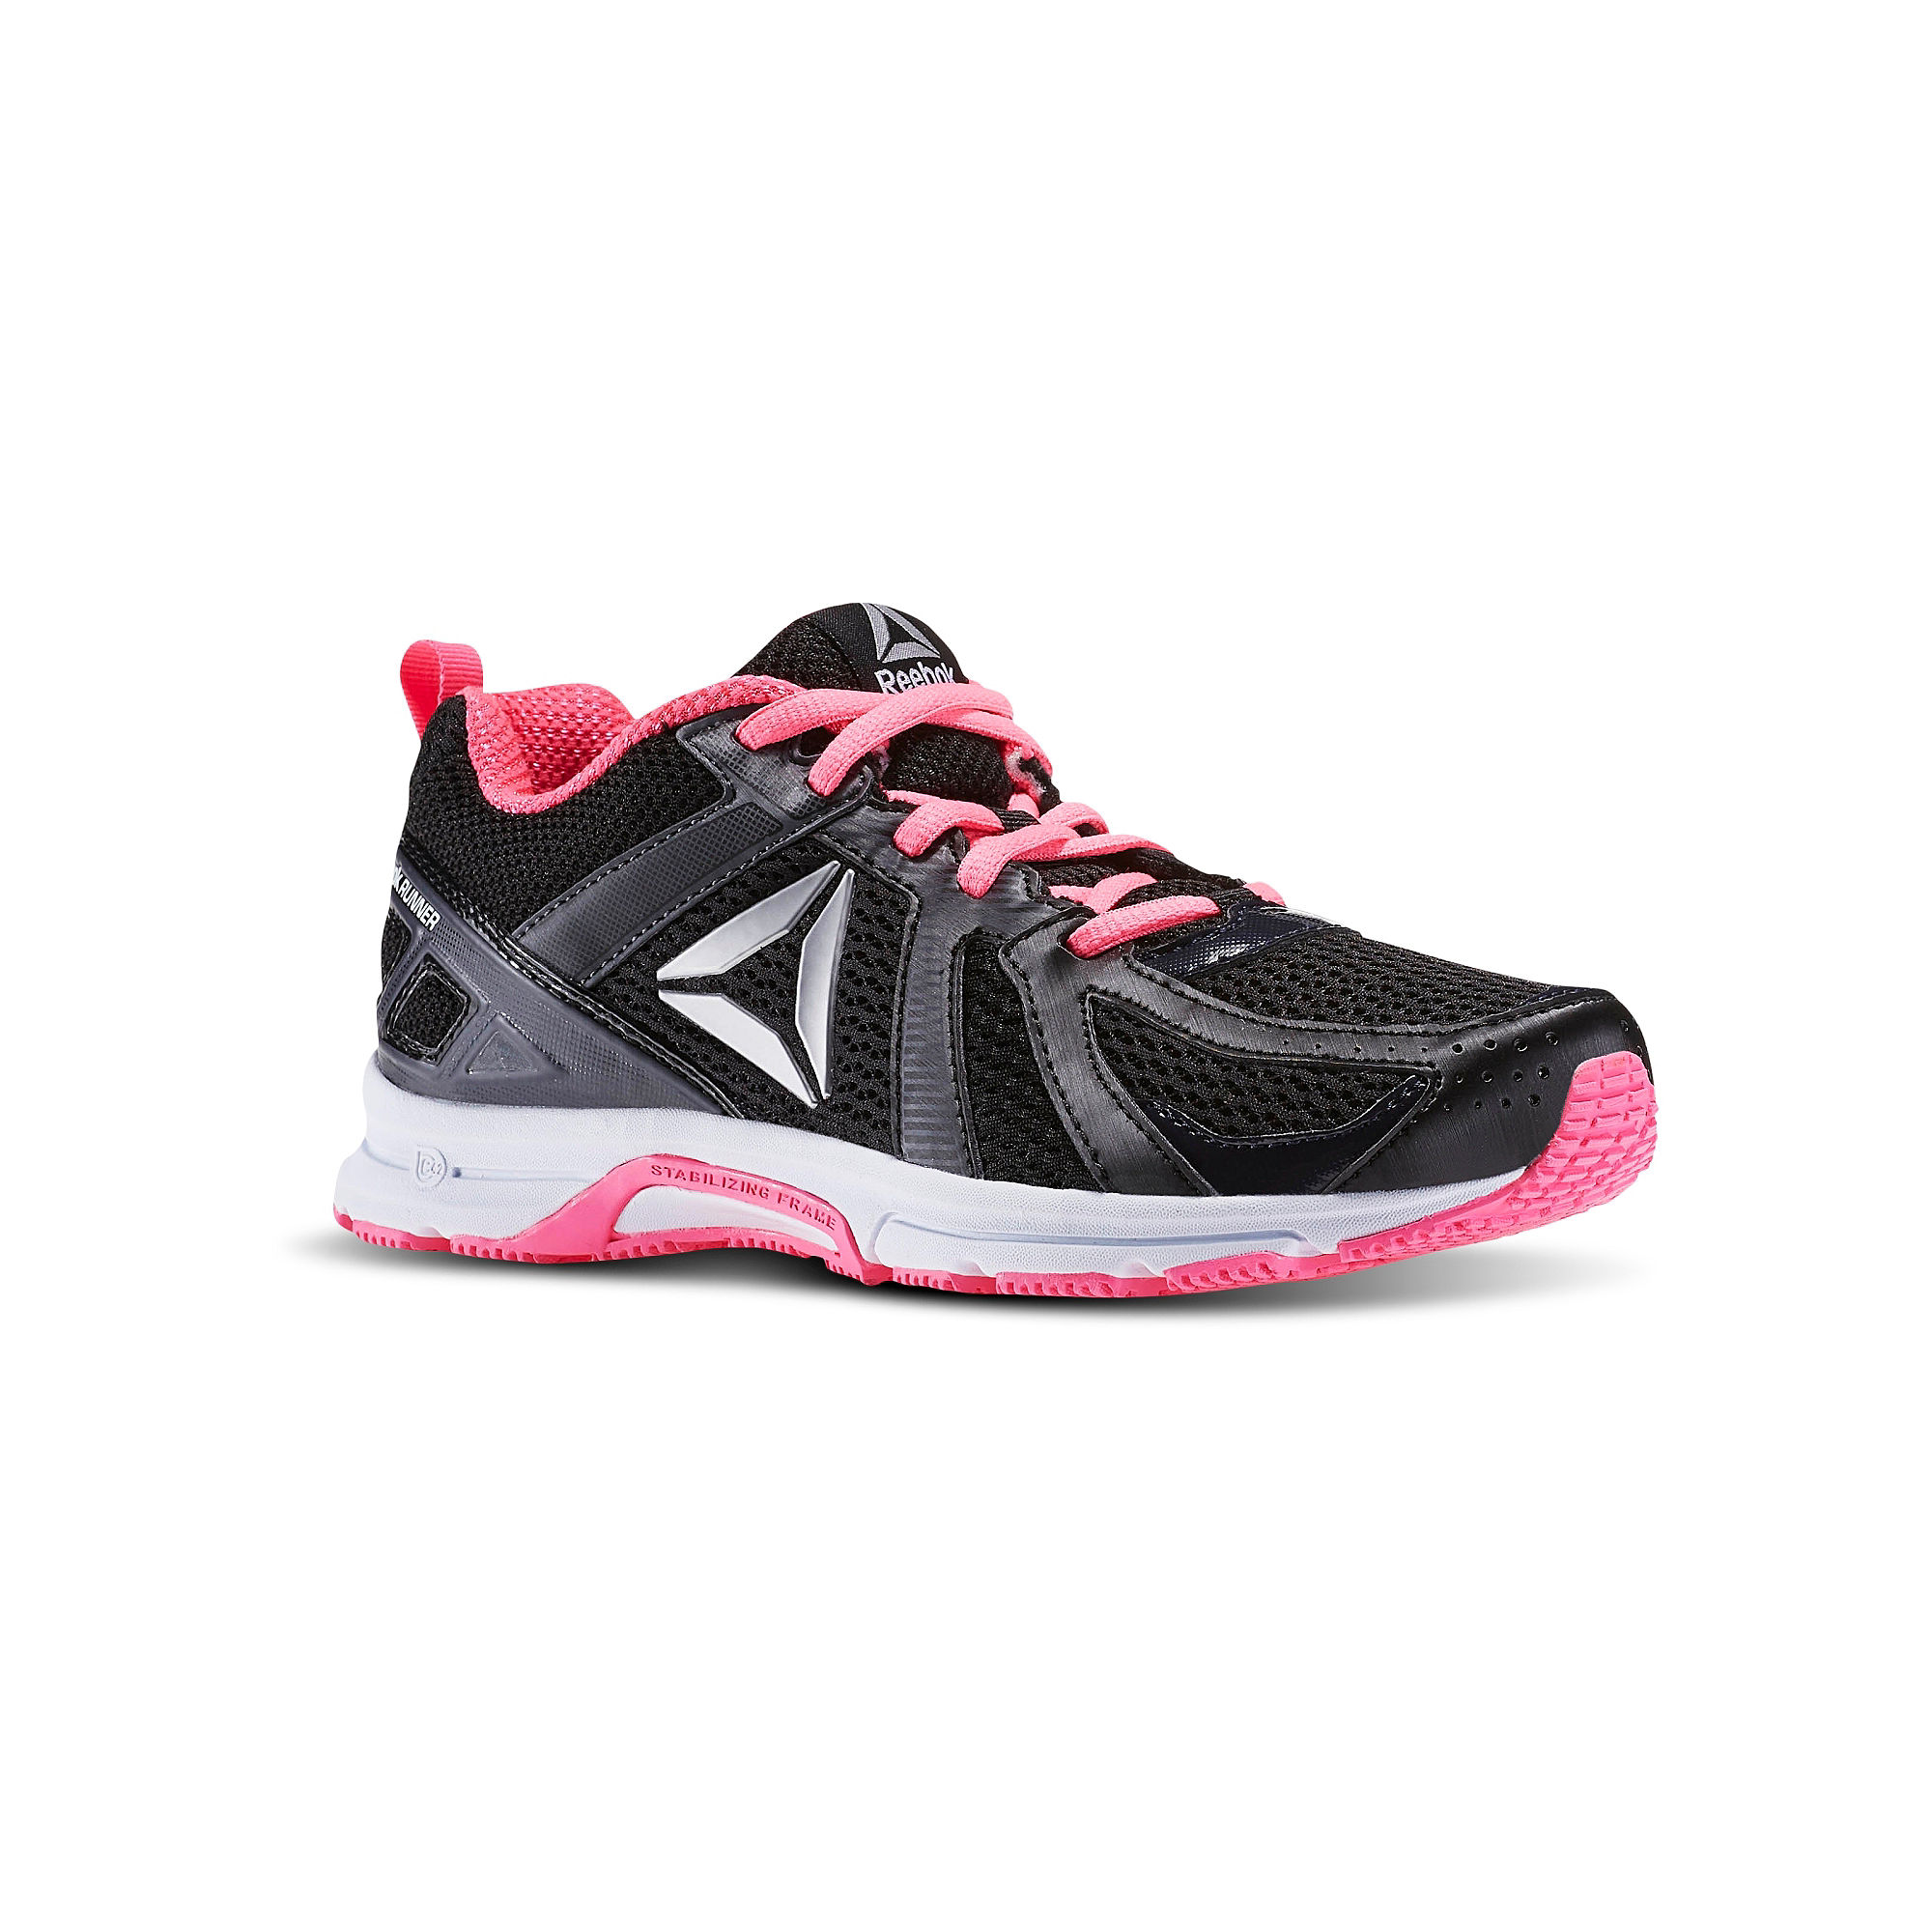 Reebok Runner MT (Women's)